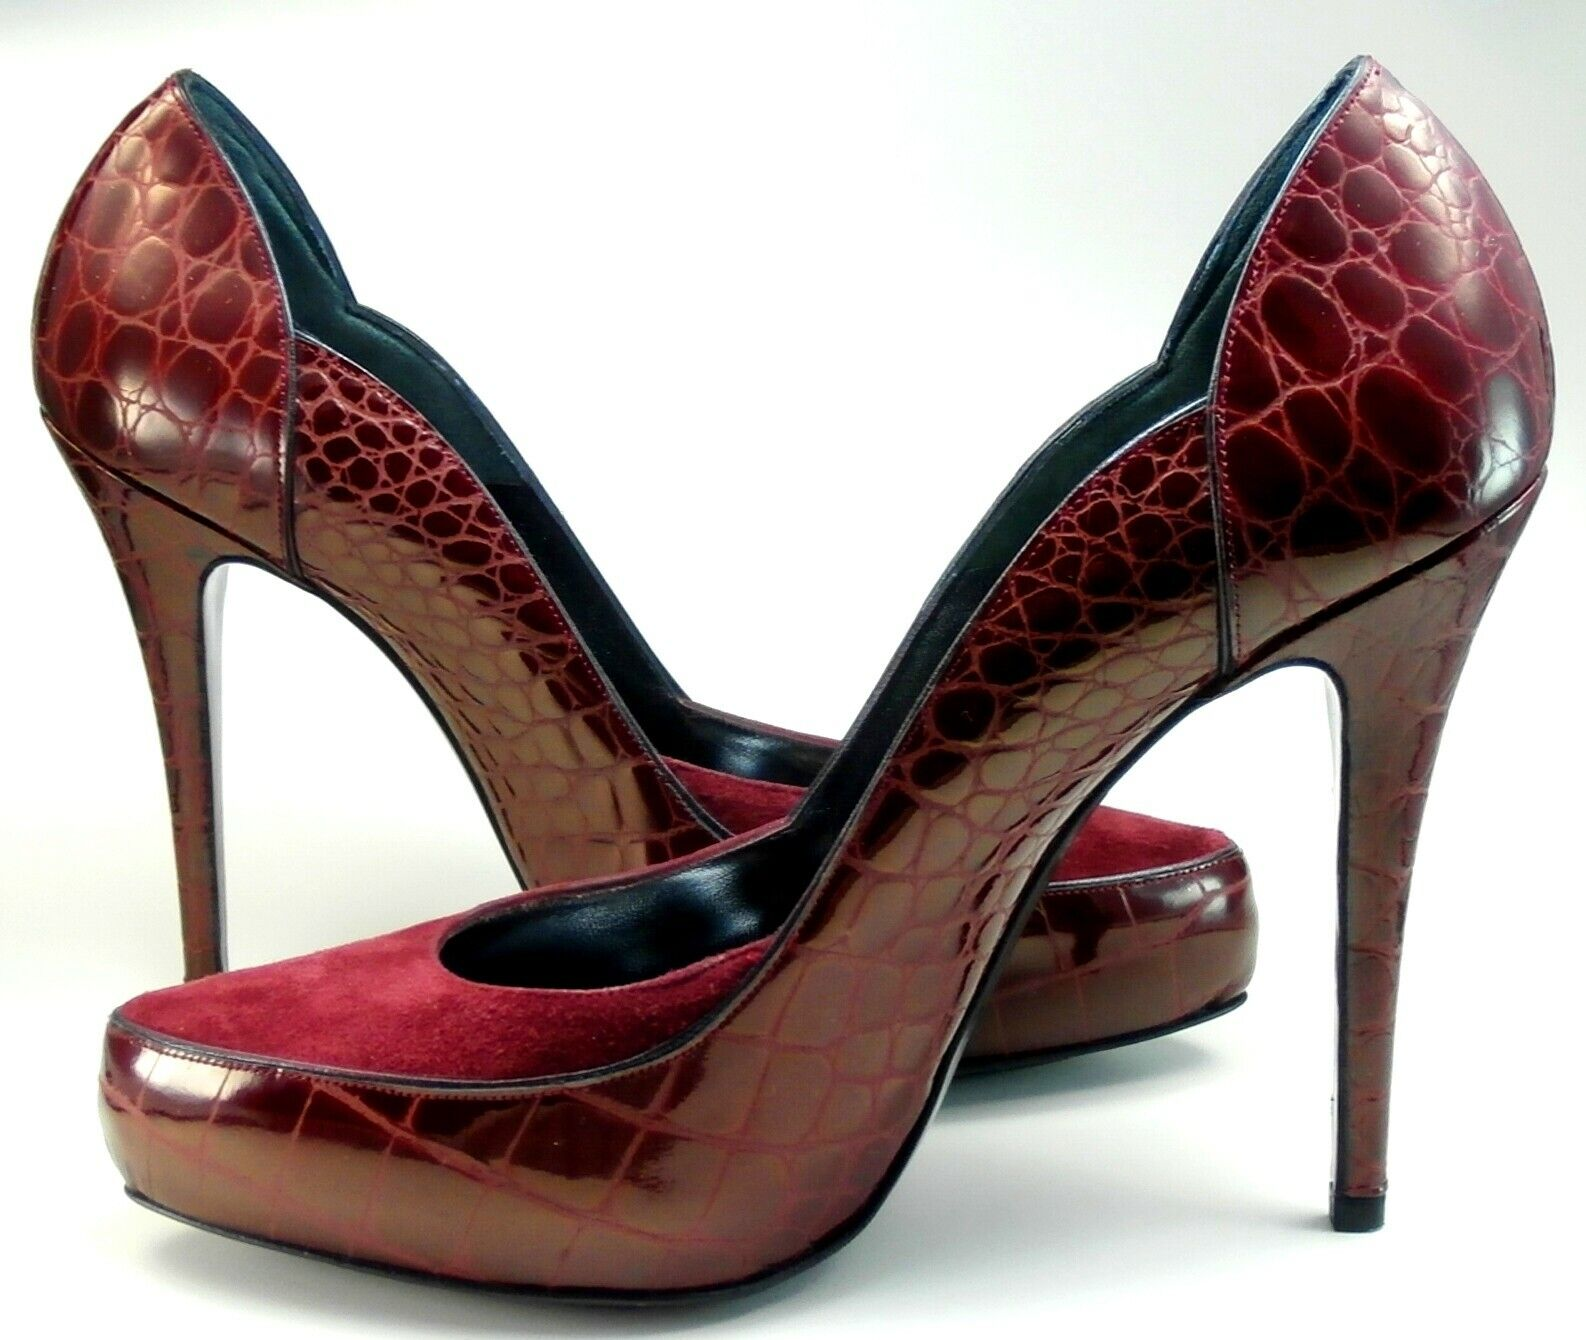 BUI Heels High Schuhe Damen Wildleder Kroko Lack bordeaux 38